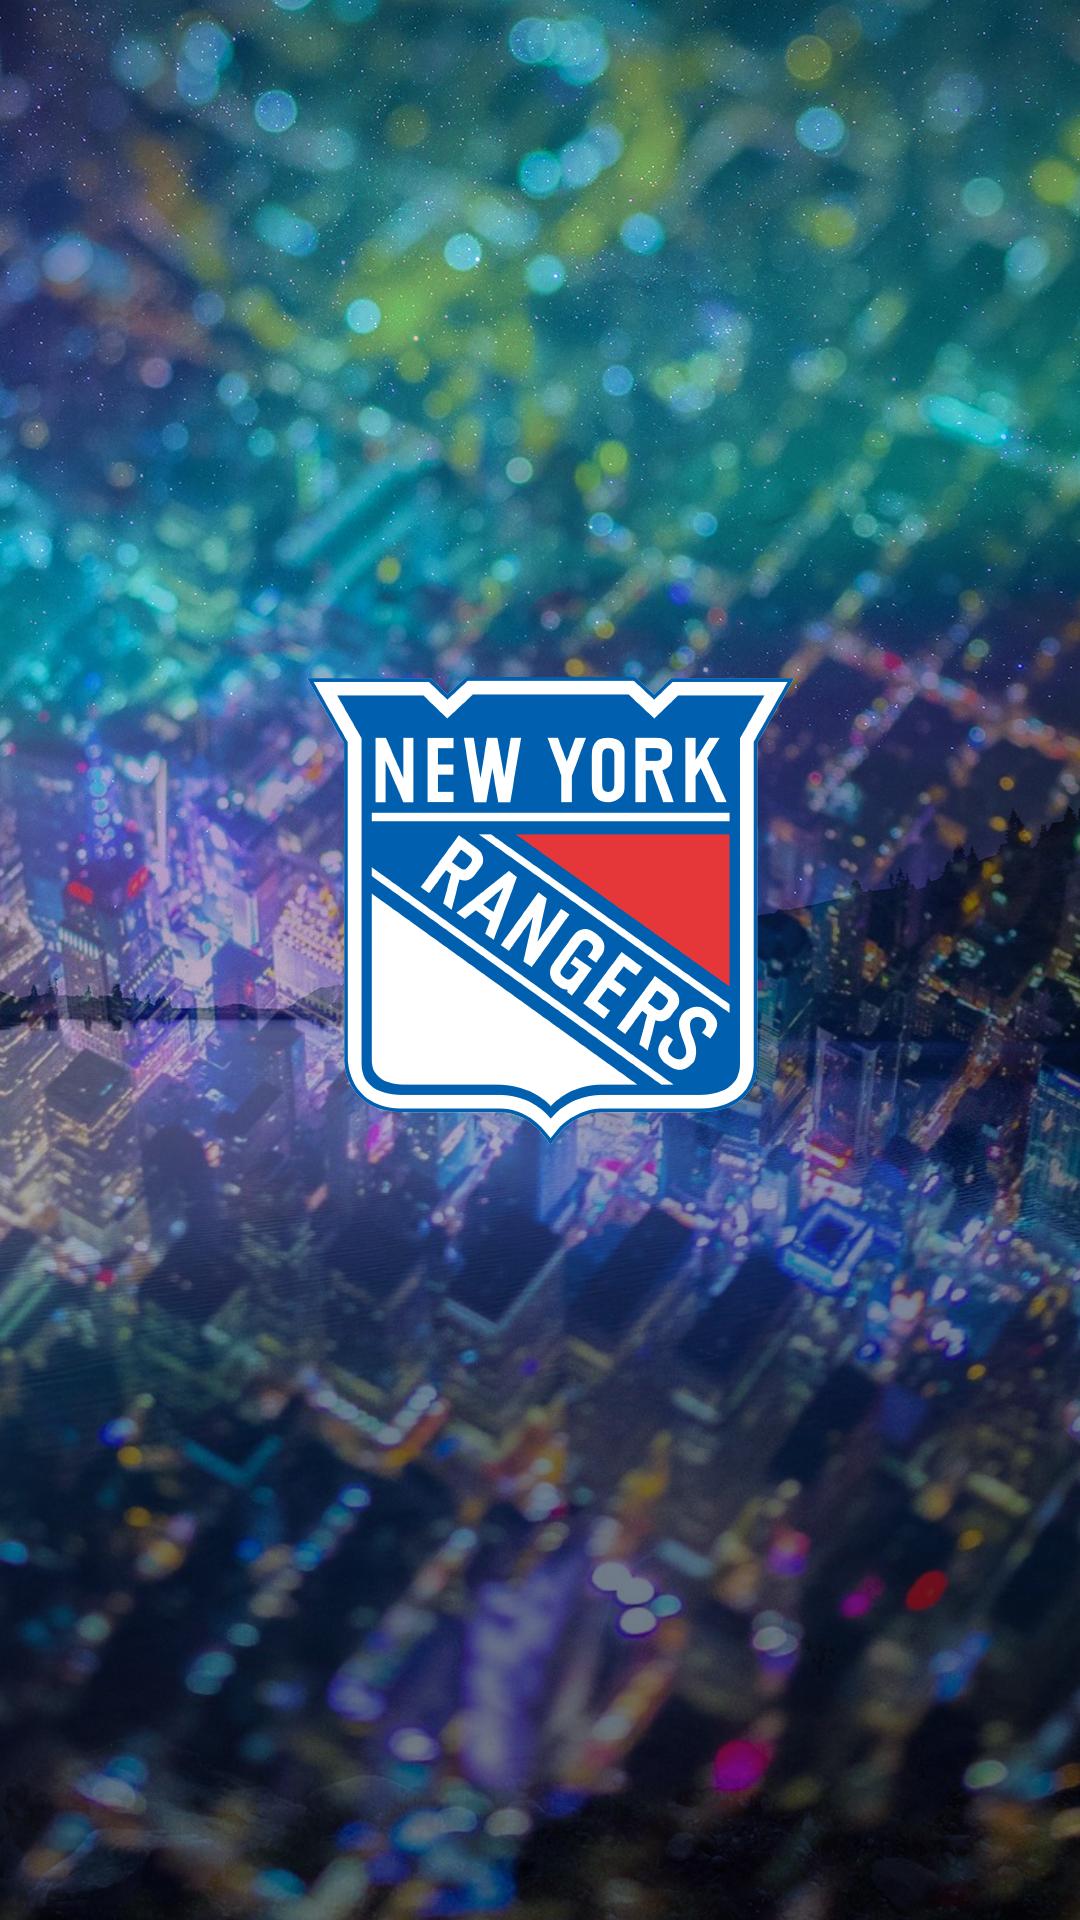 New York Rangers Iphone Wallpapers On Wallpaperdog